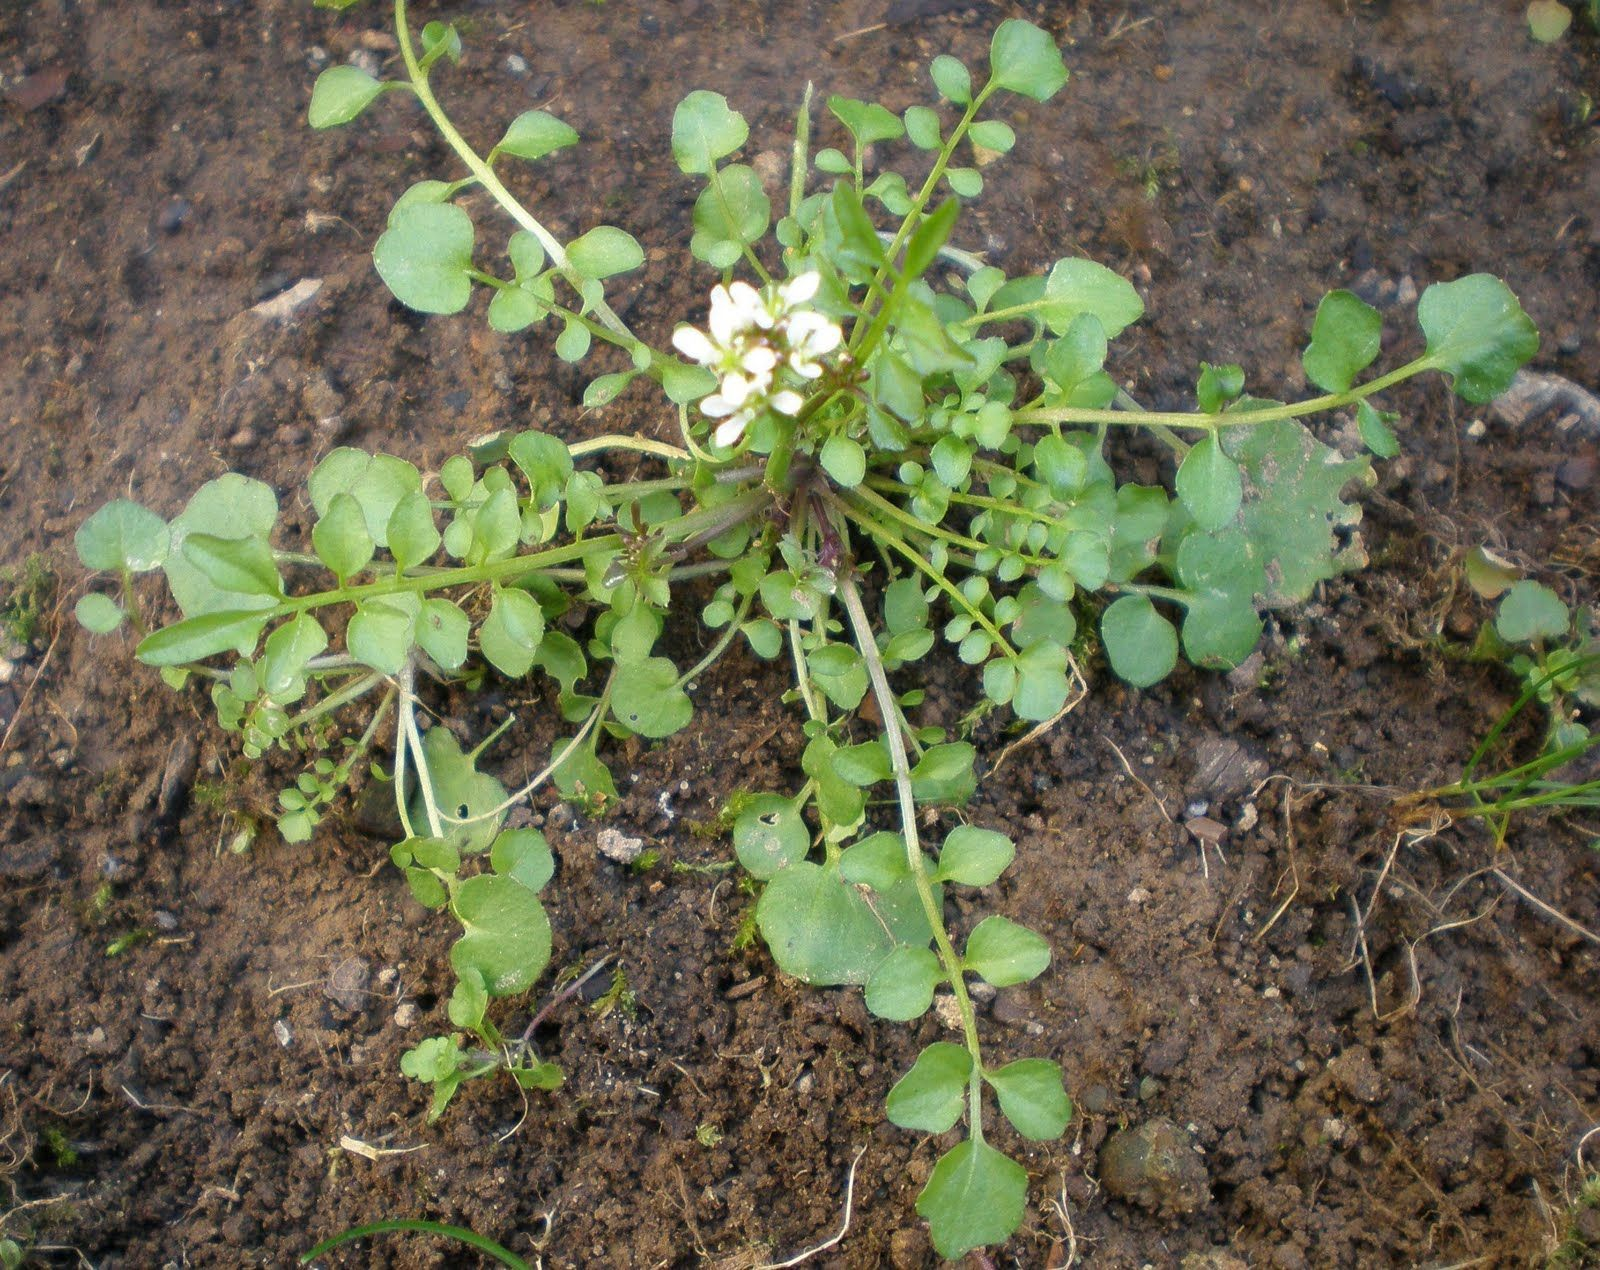 Identifying weeds in flower beds - Gardens